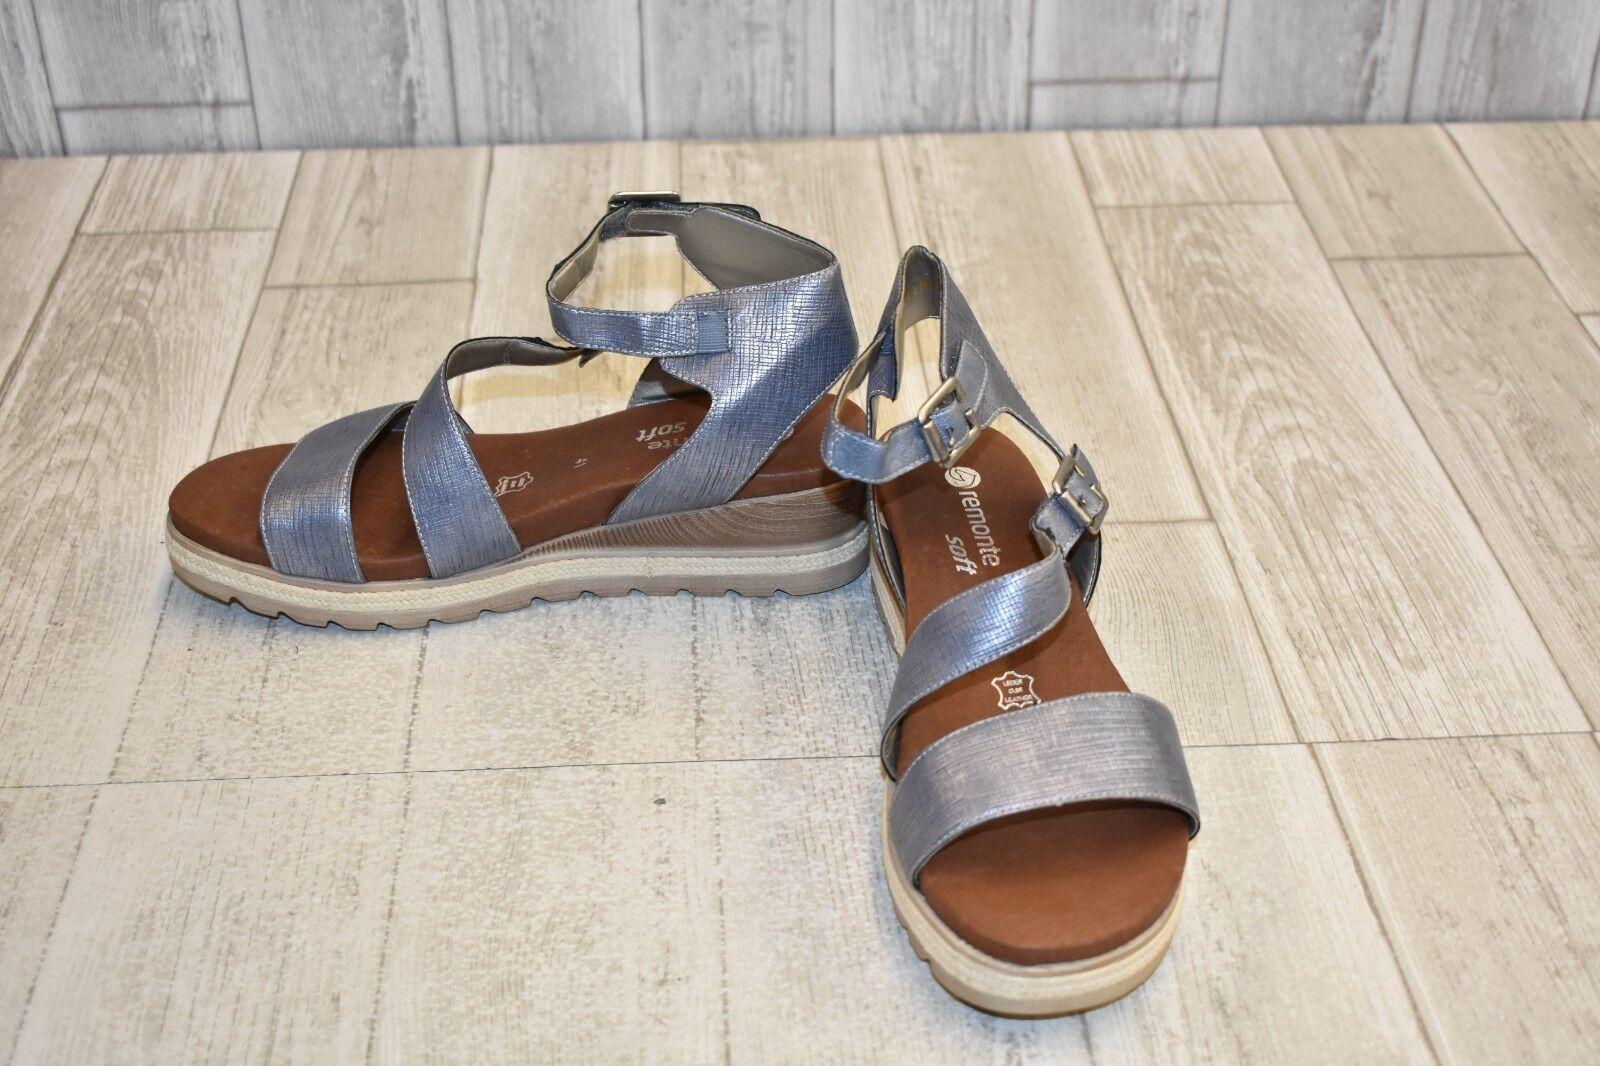 Remonte Rieker D6351 Icess 51 Sandals - Women's Size 9.5 - bluee